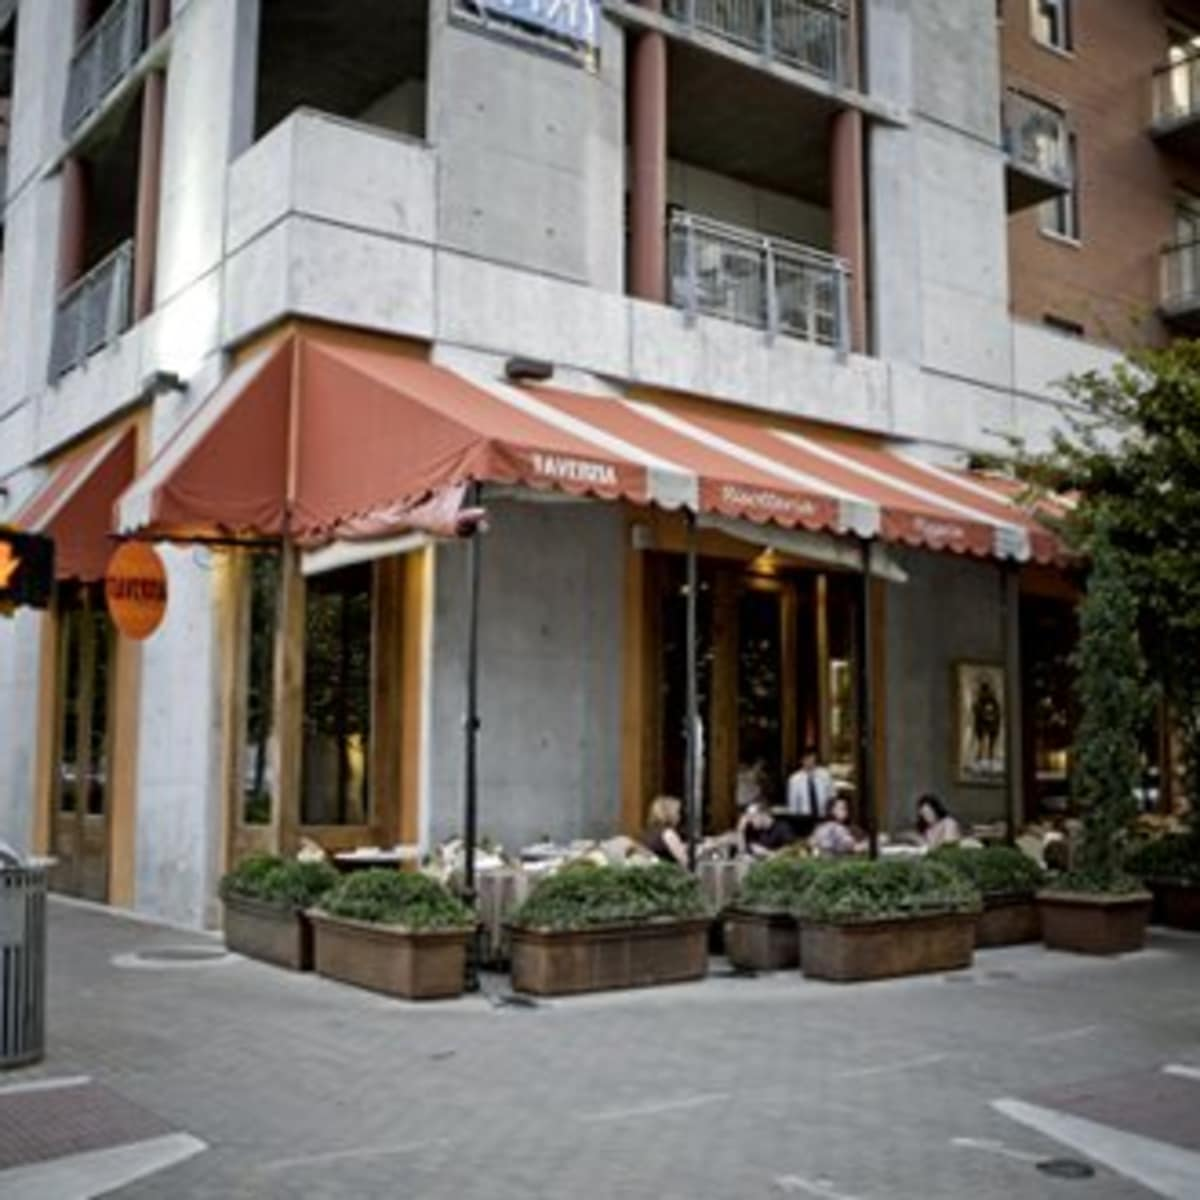 Austin Photo: Places_Food_taverna_exterior